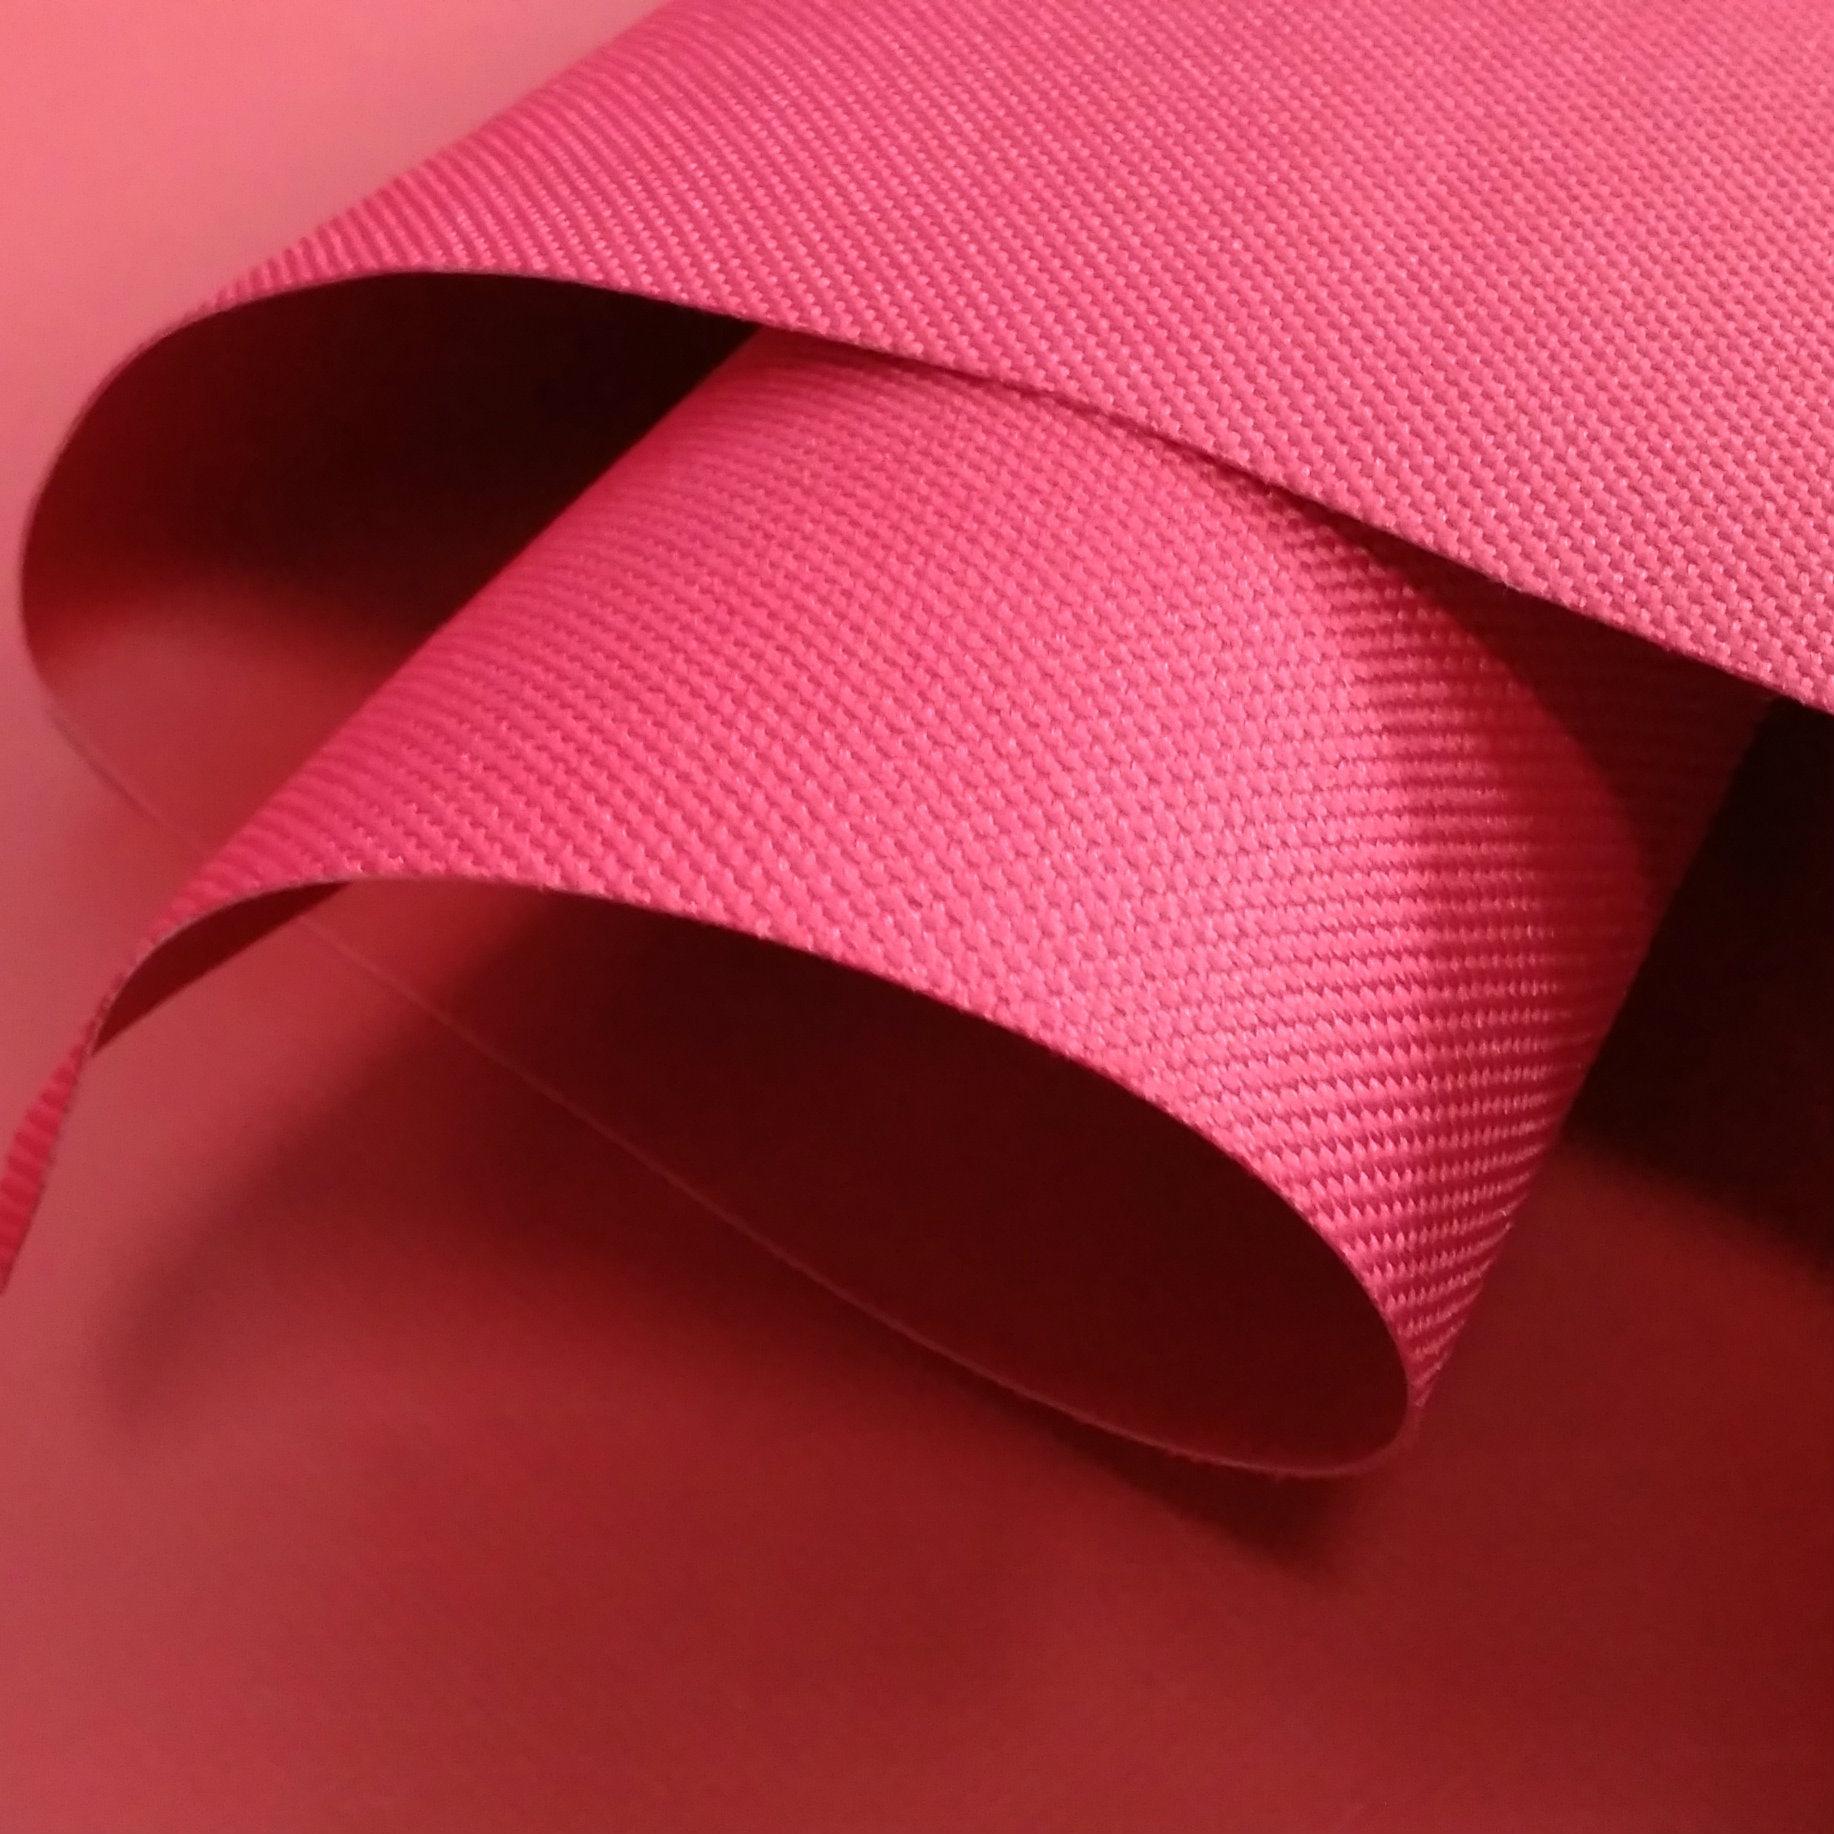 Kodura Fabric, 600Dx300D PVC, 059